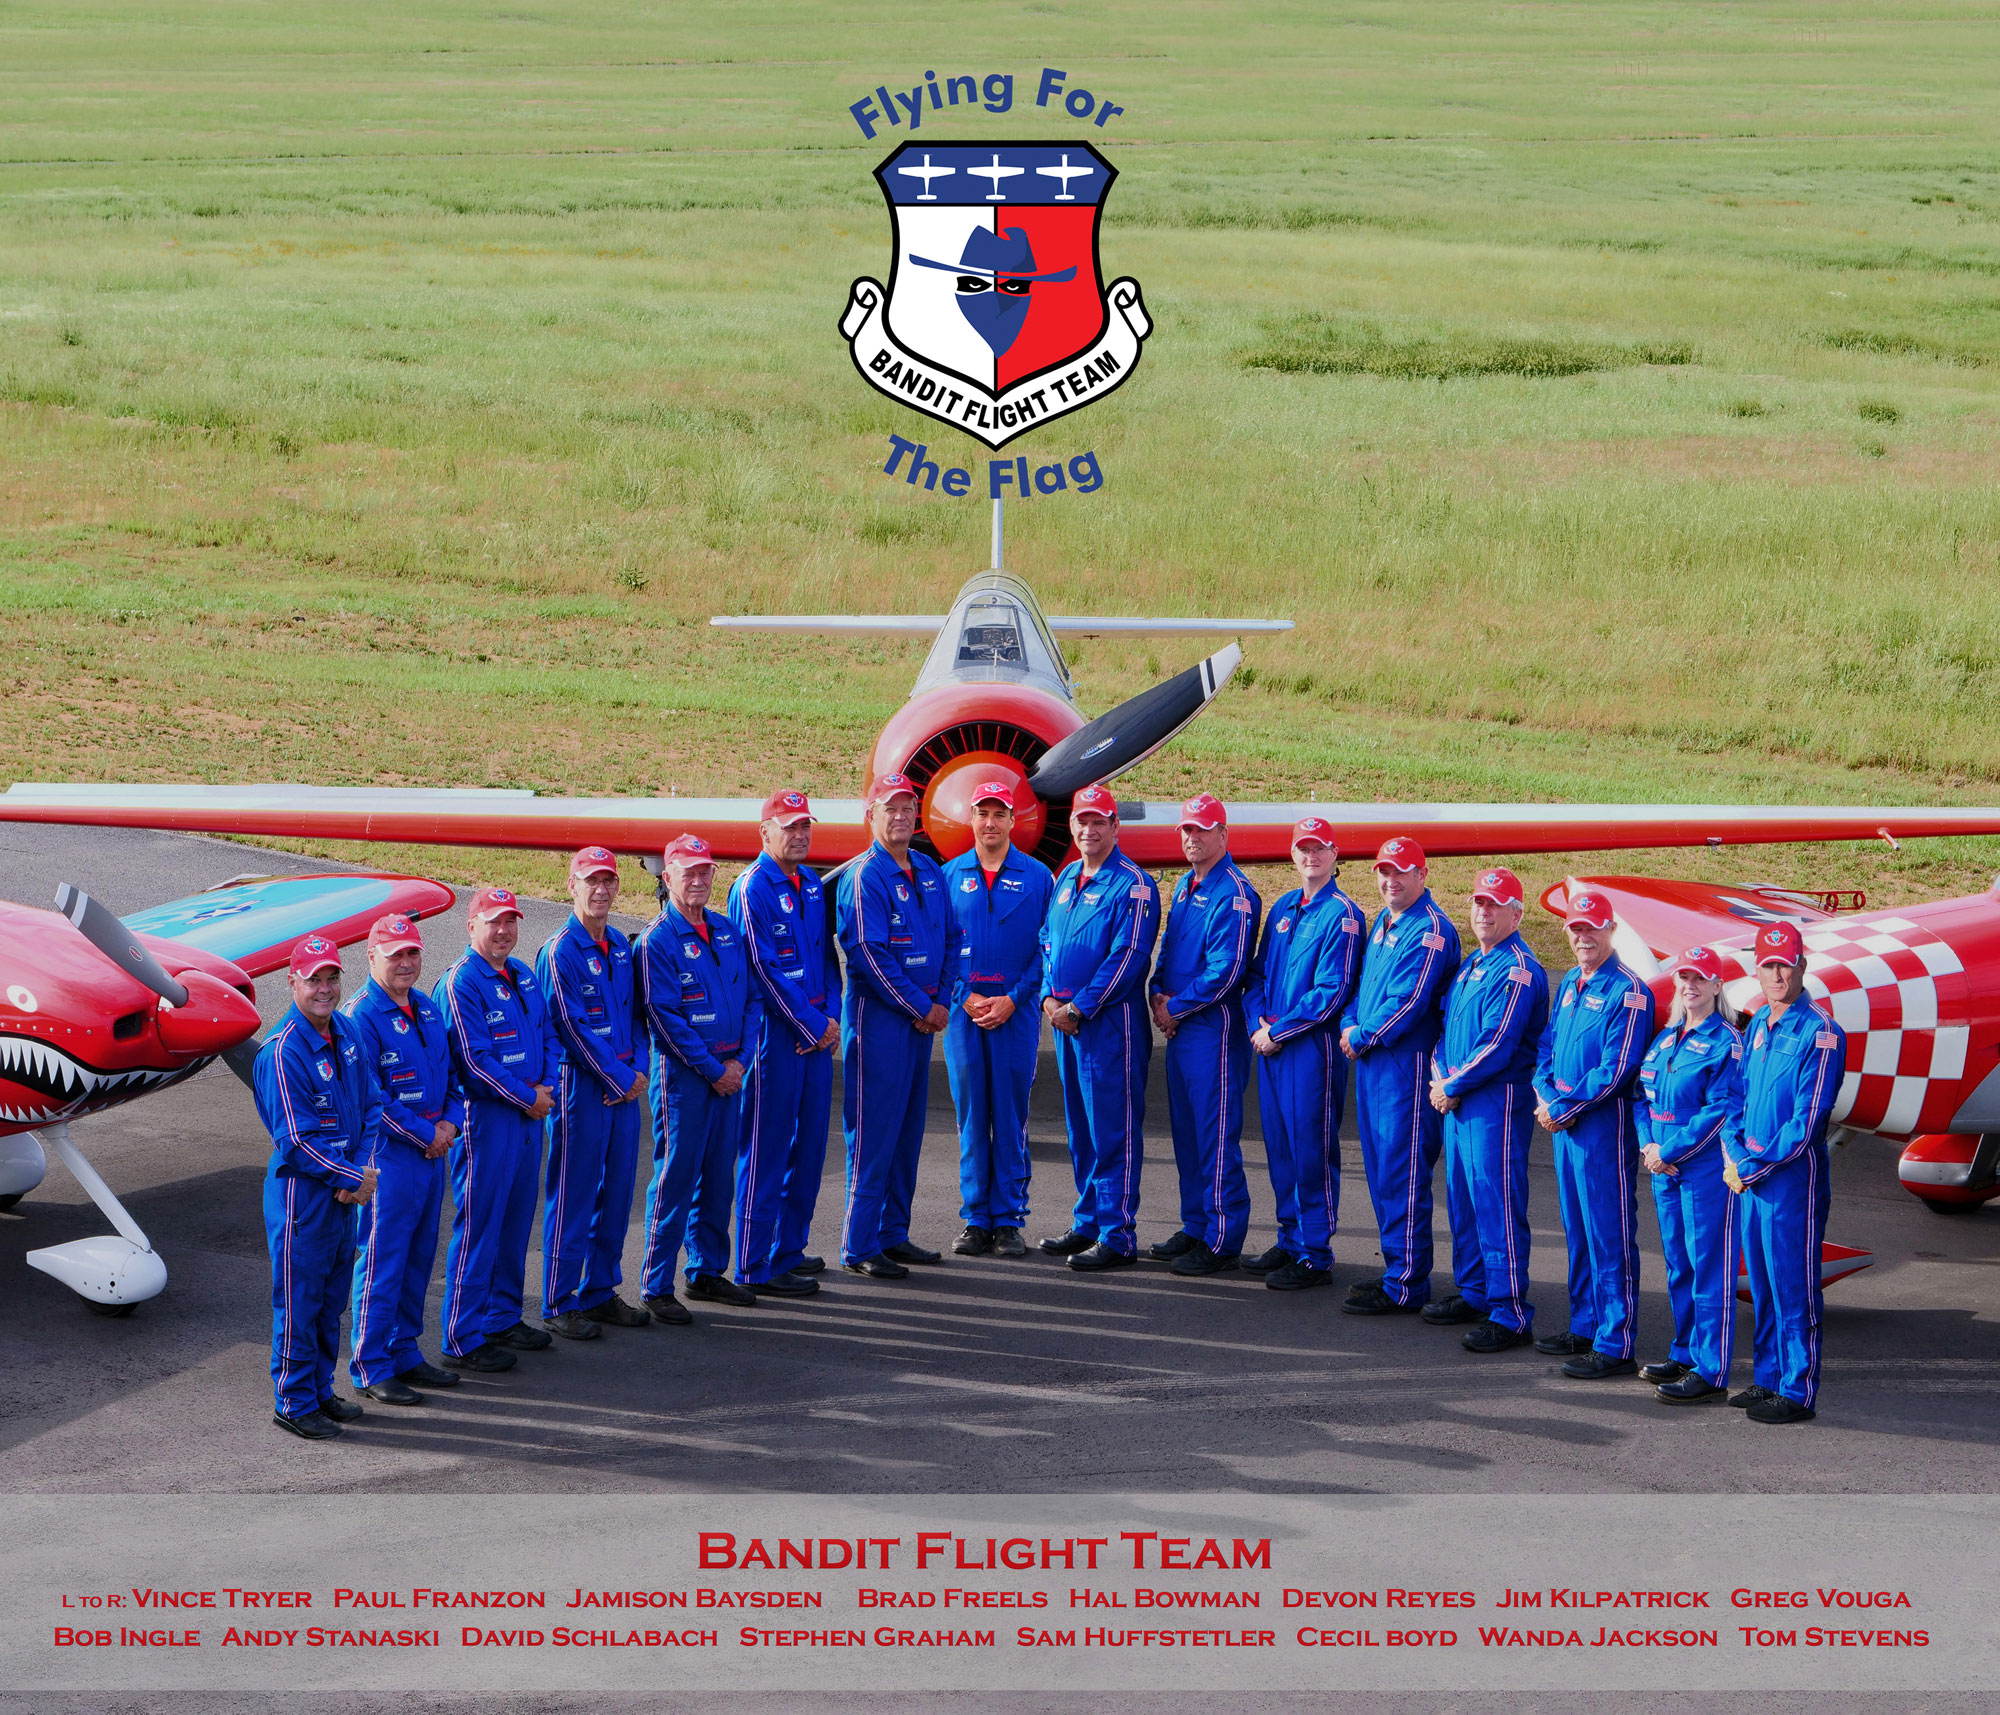 2019-Bandit Flight Team Photo